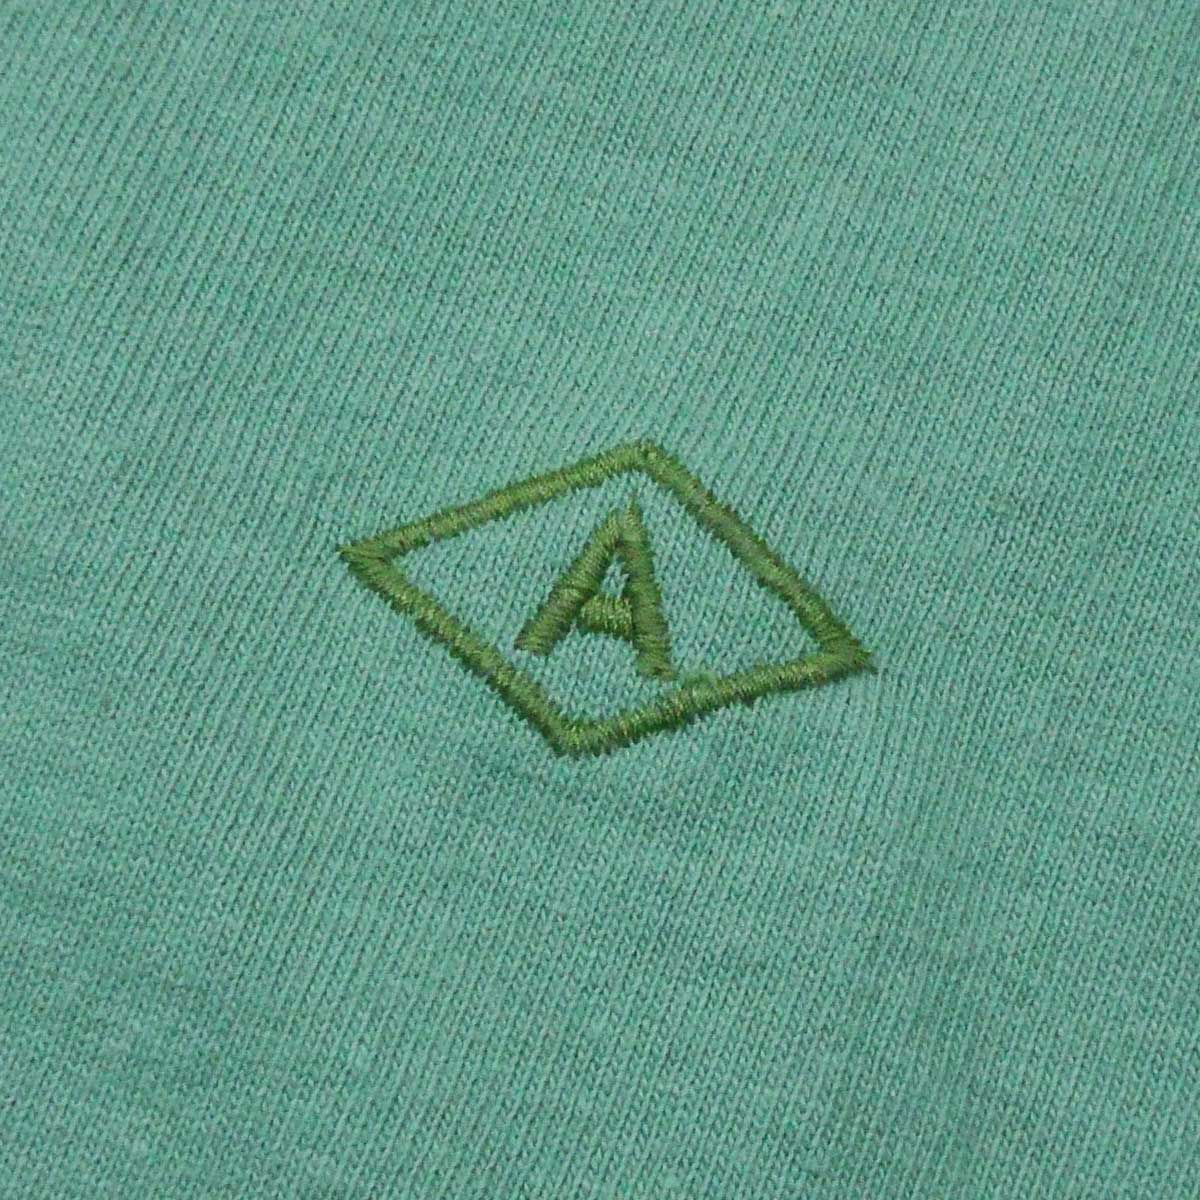 Almond Surf アーモンドサーフボードデザイン DECADES S/S TEE